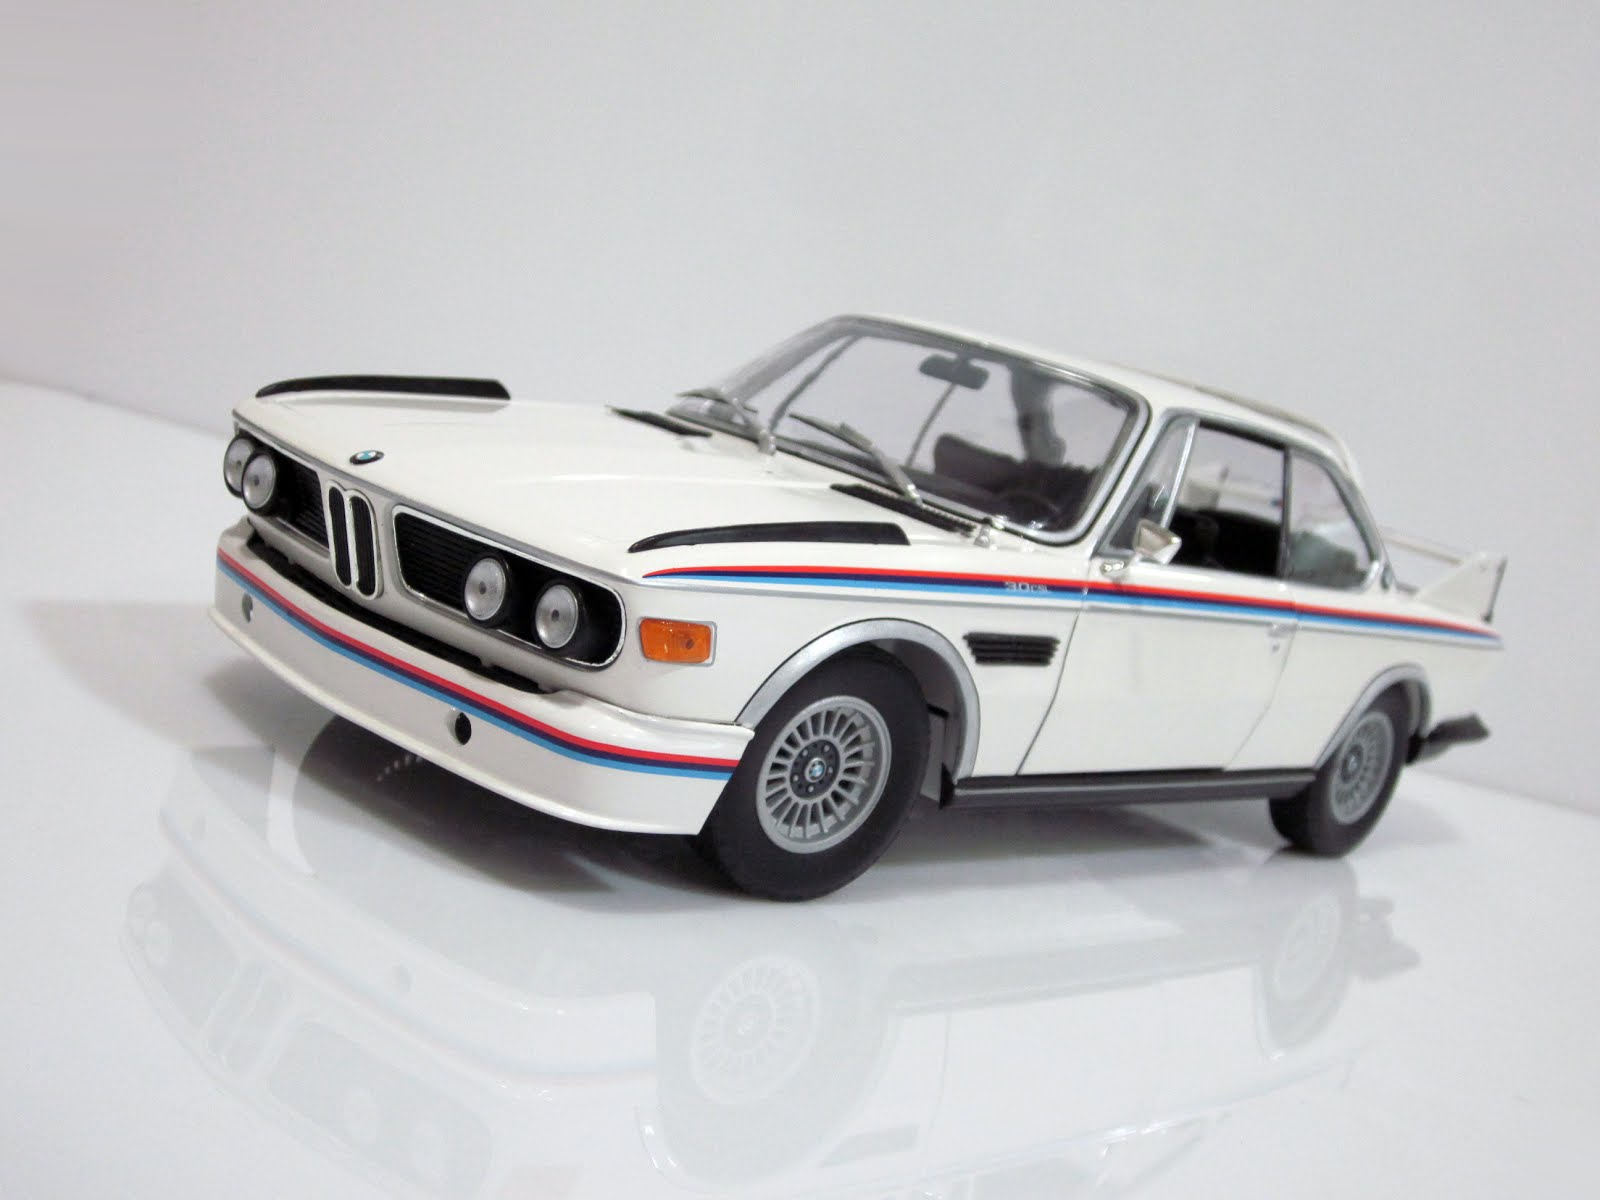 BMW 3.0 CSL [E9] 1973 - Minichamps